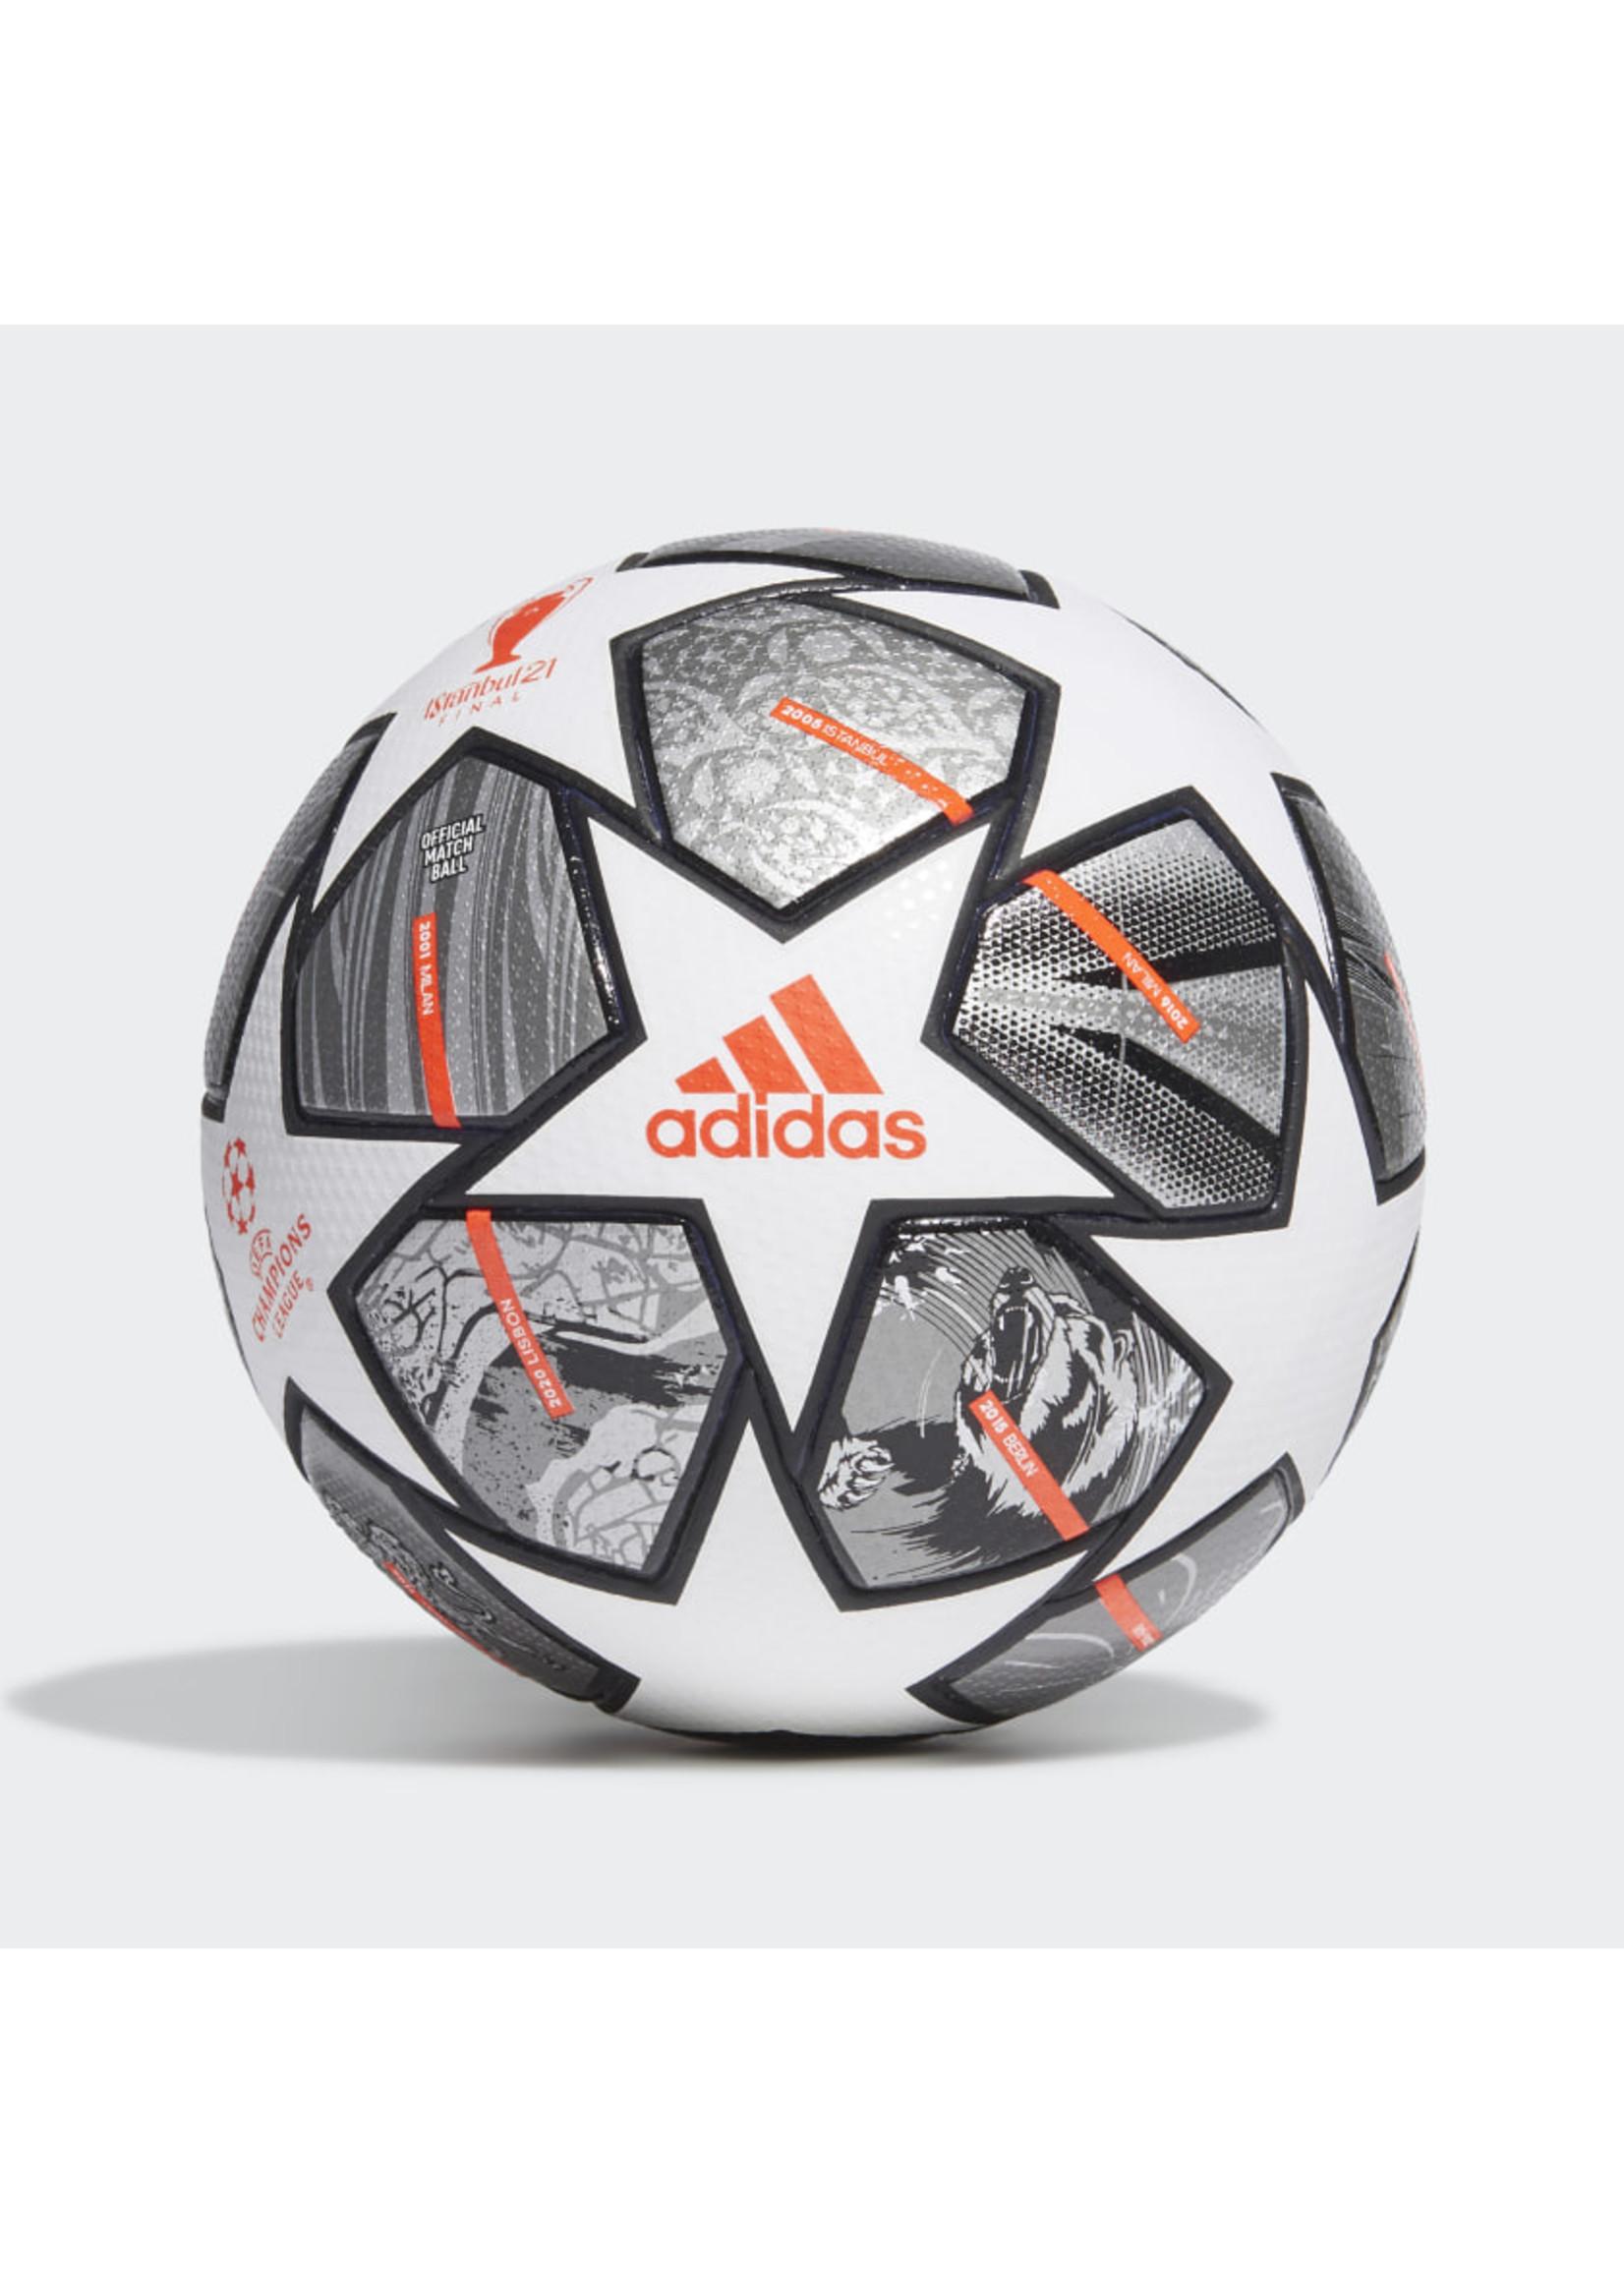 Adidas Champions League Finale Pro Official